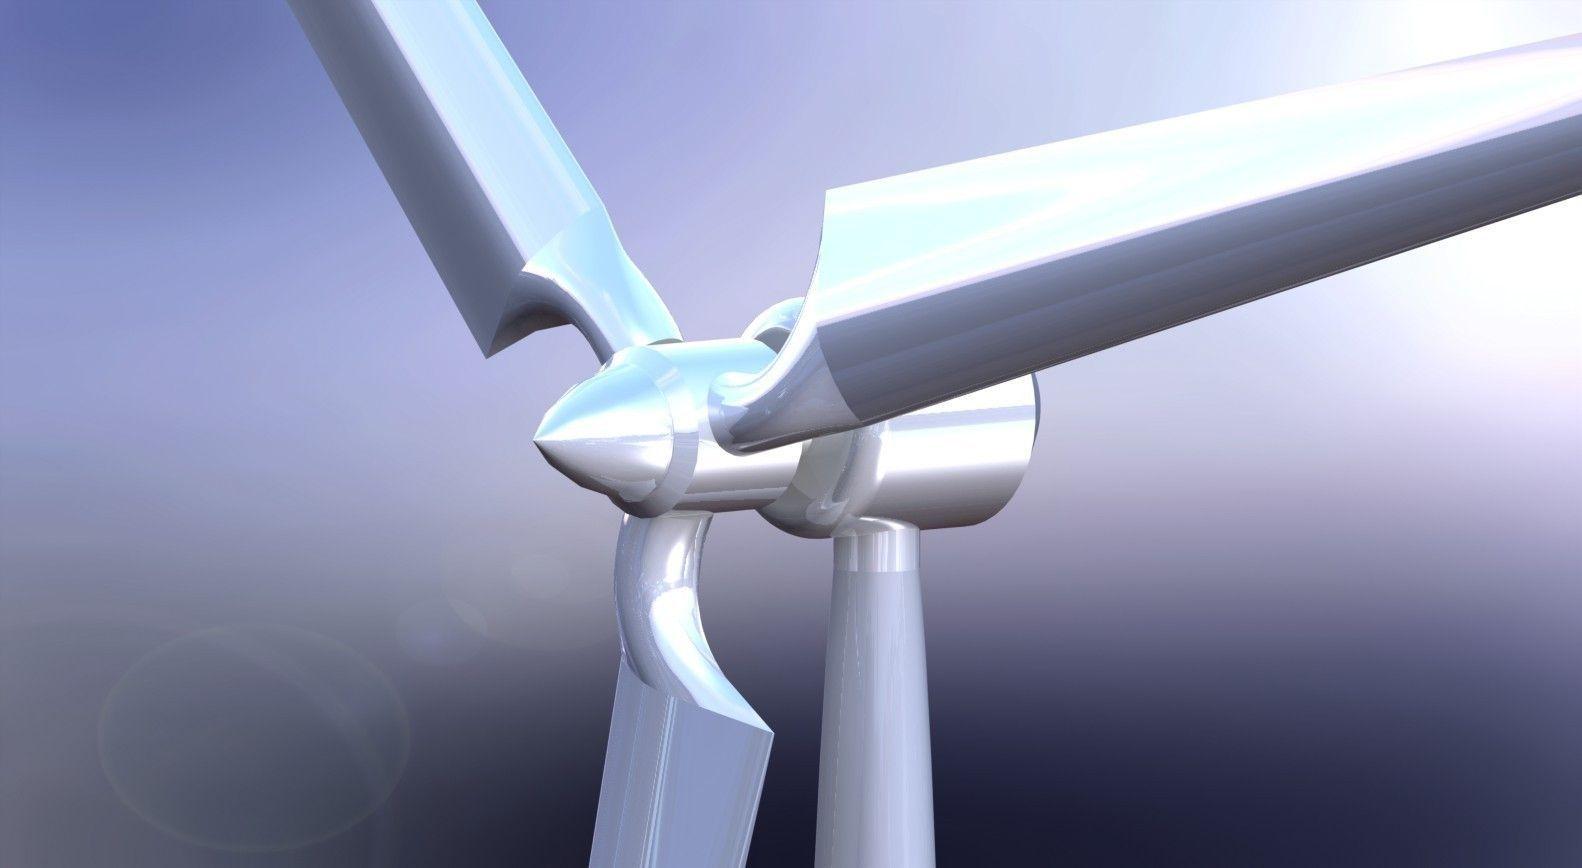 3d Wind Turbine Model – Wonderful Image Gallery